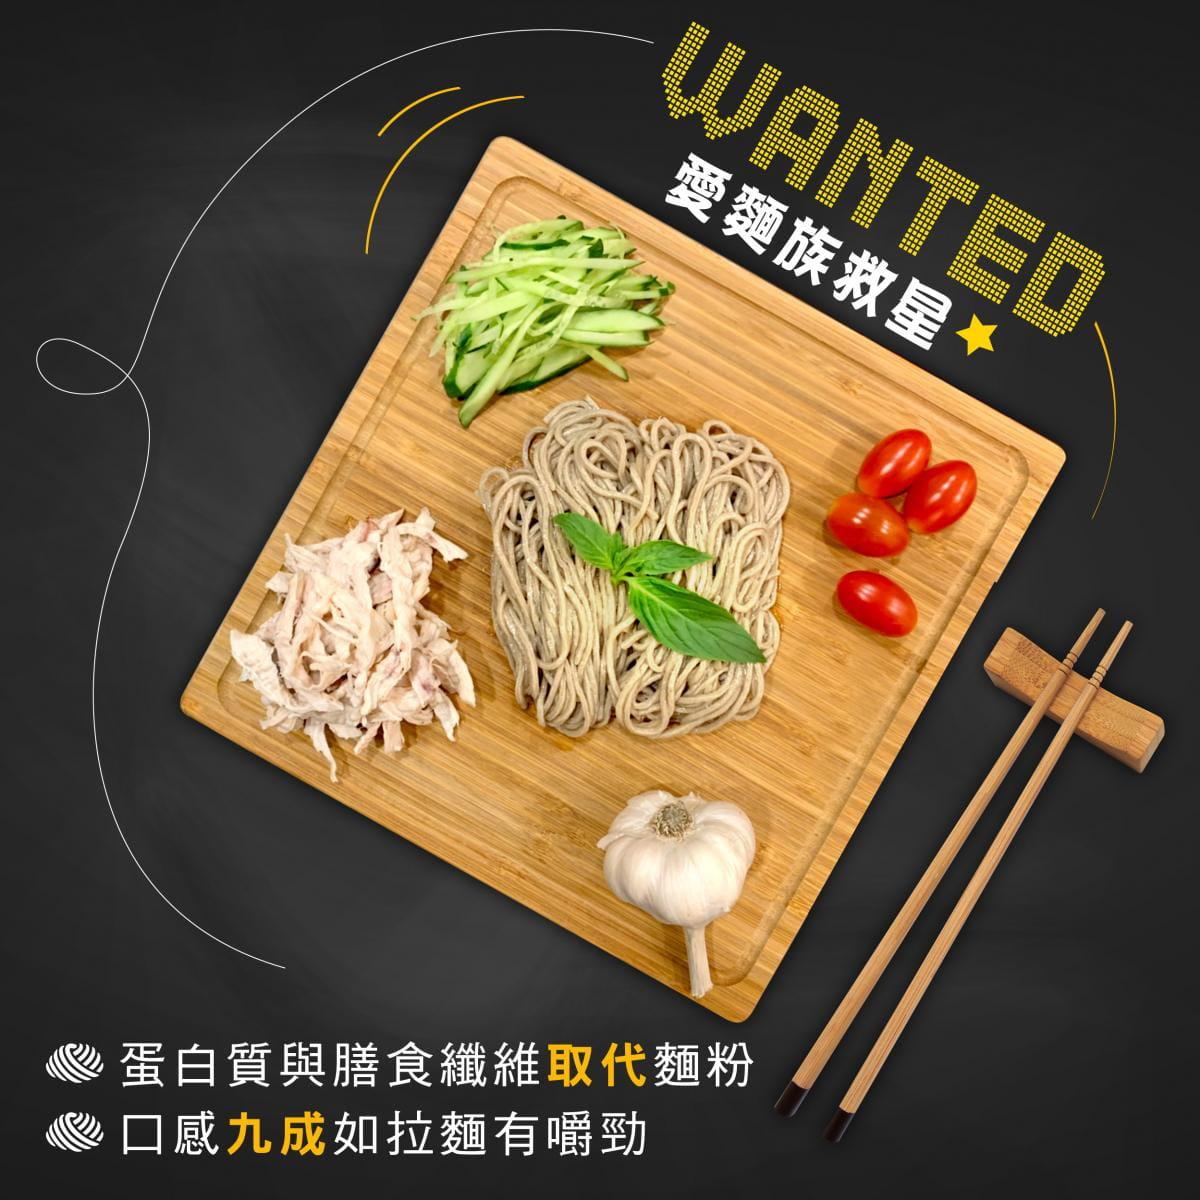 【Bango】醣質1克拉麵+手作麵包組 8